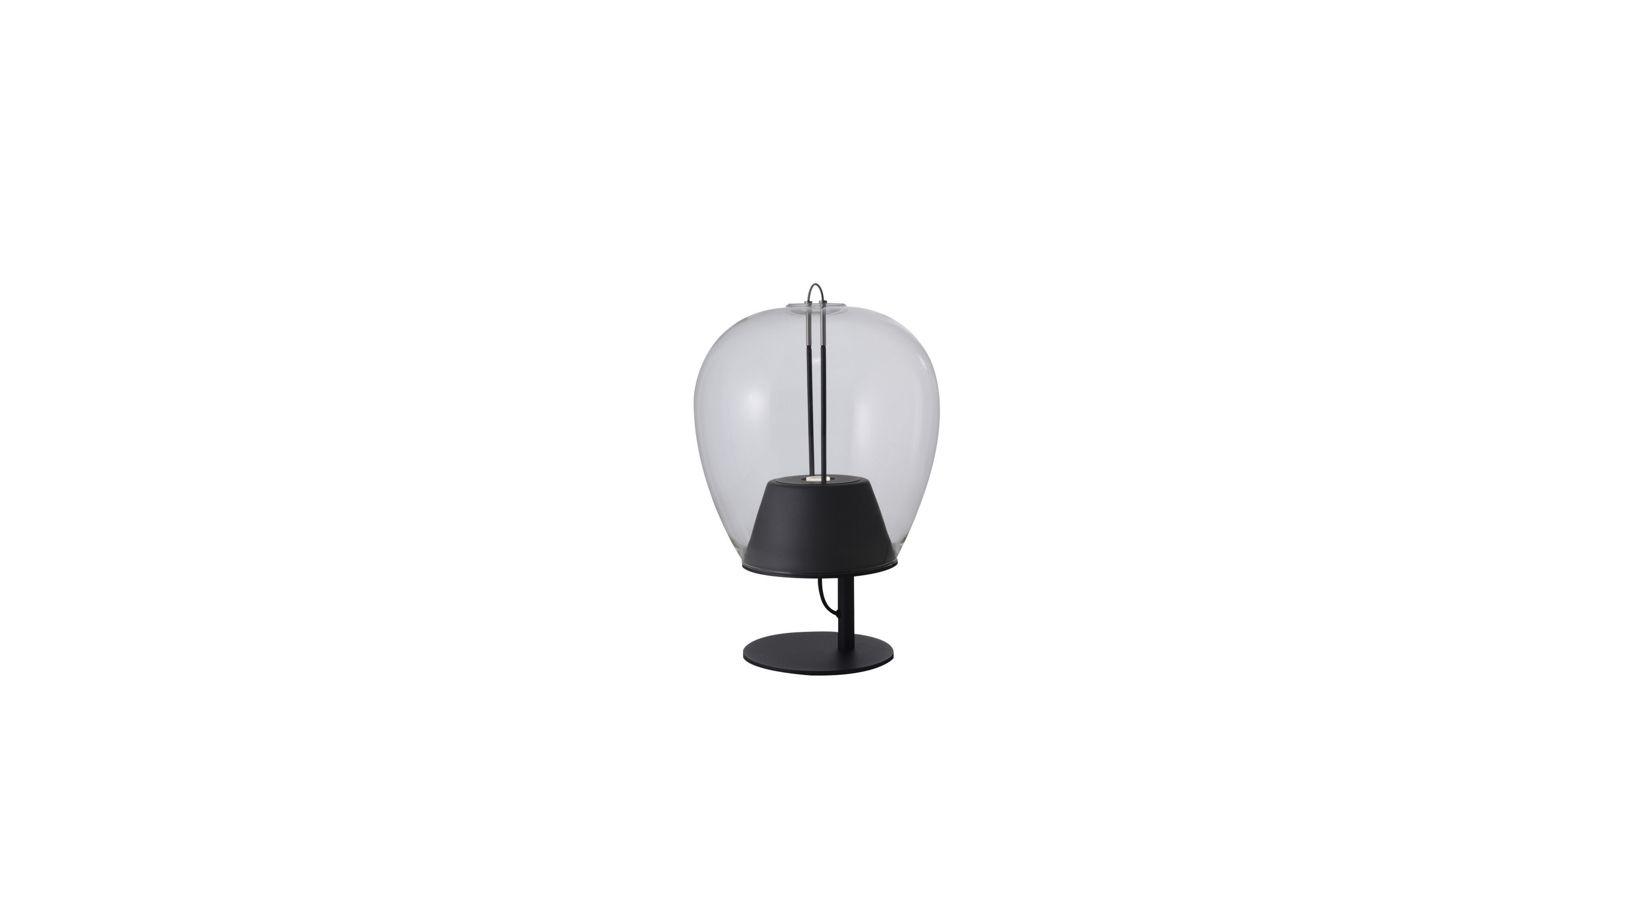 diaph tischleuchte roche bobois. Black Bedroom Furniture Sets. Home Design Ideas